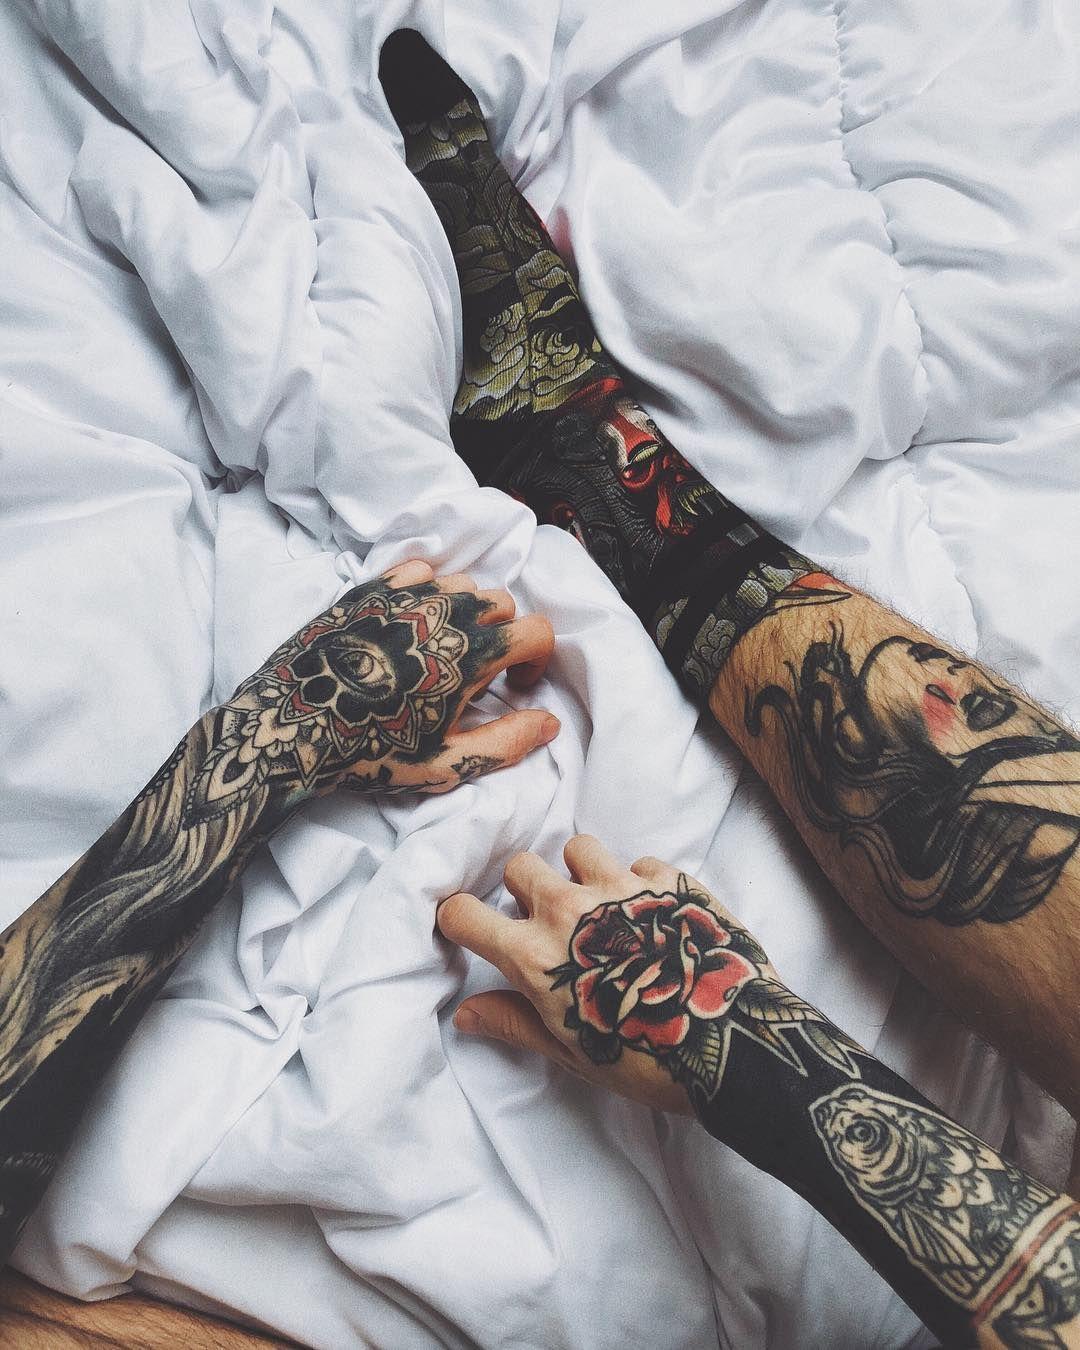 13 2k Likes 101 Comments Ink St Boy Frankfurt Vienna Inkstaboy On Instagram Advertisement Tattoo People Body Art Tattoos Ink Tattoo